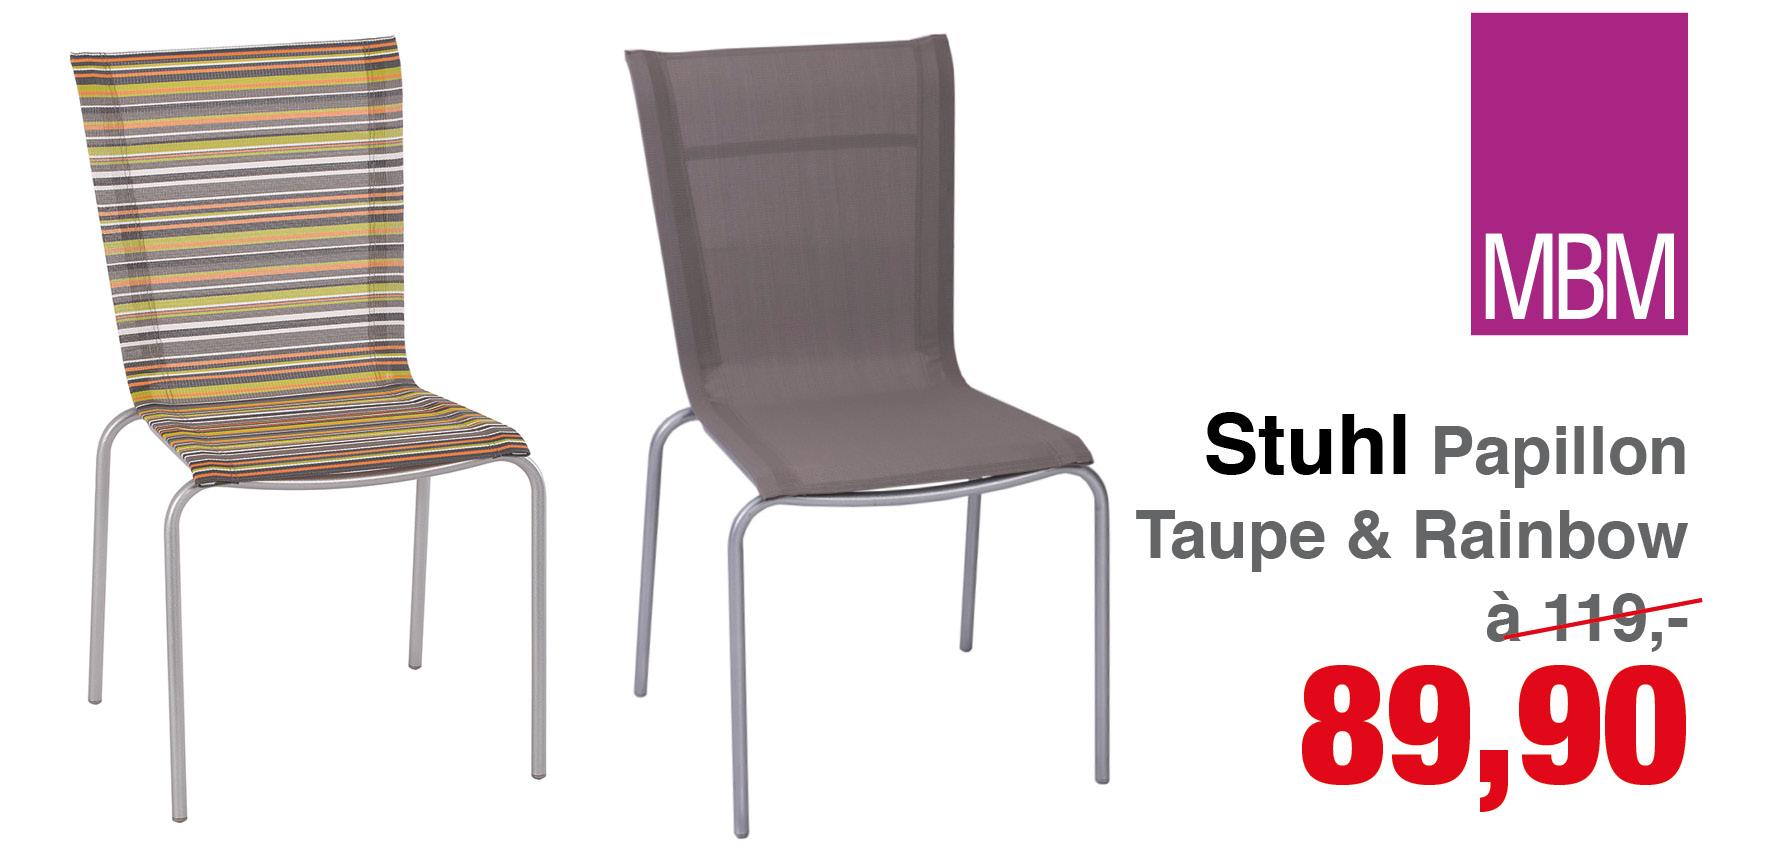 stuhl papillon mbm gartenm bel lagerverkauf. Black Bedroom Furniture Sets. Home Design Ideas